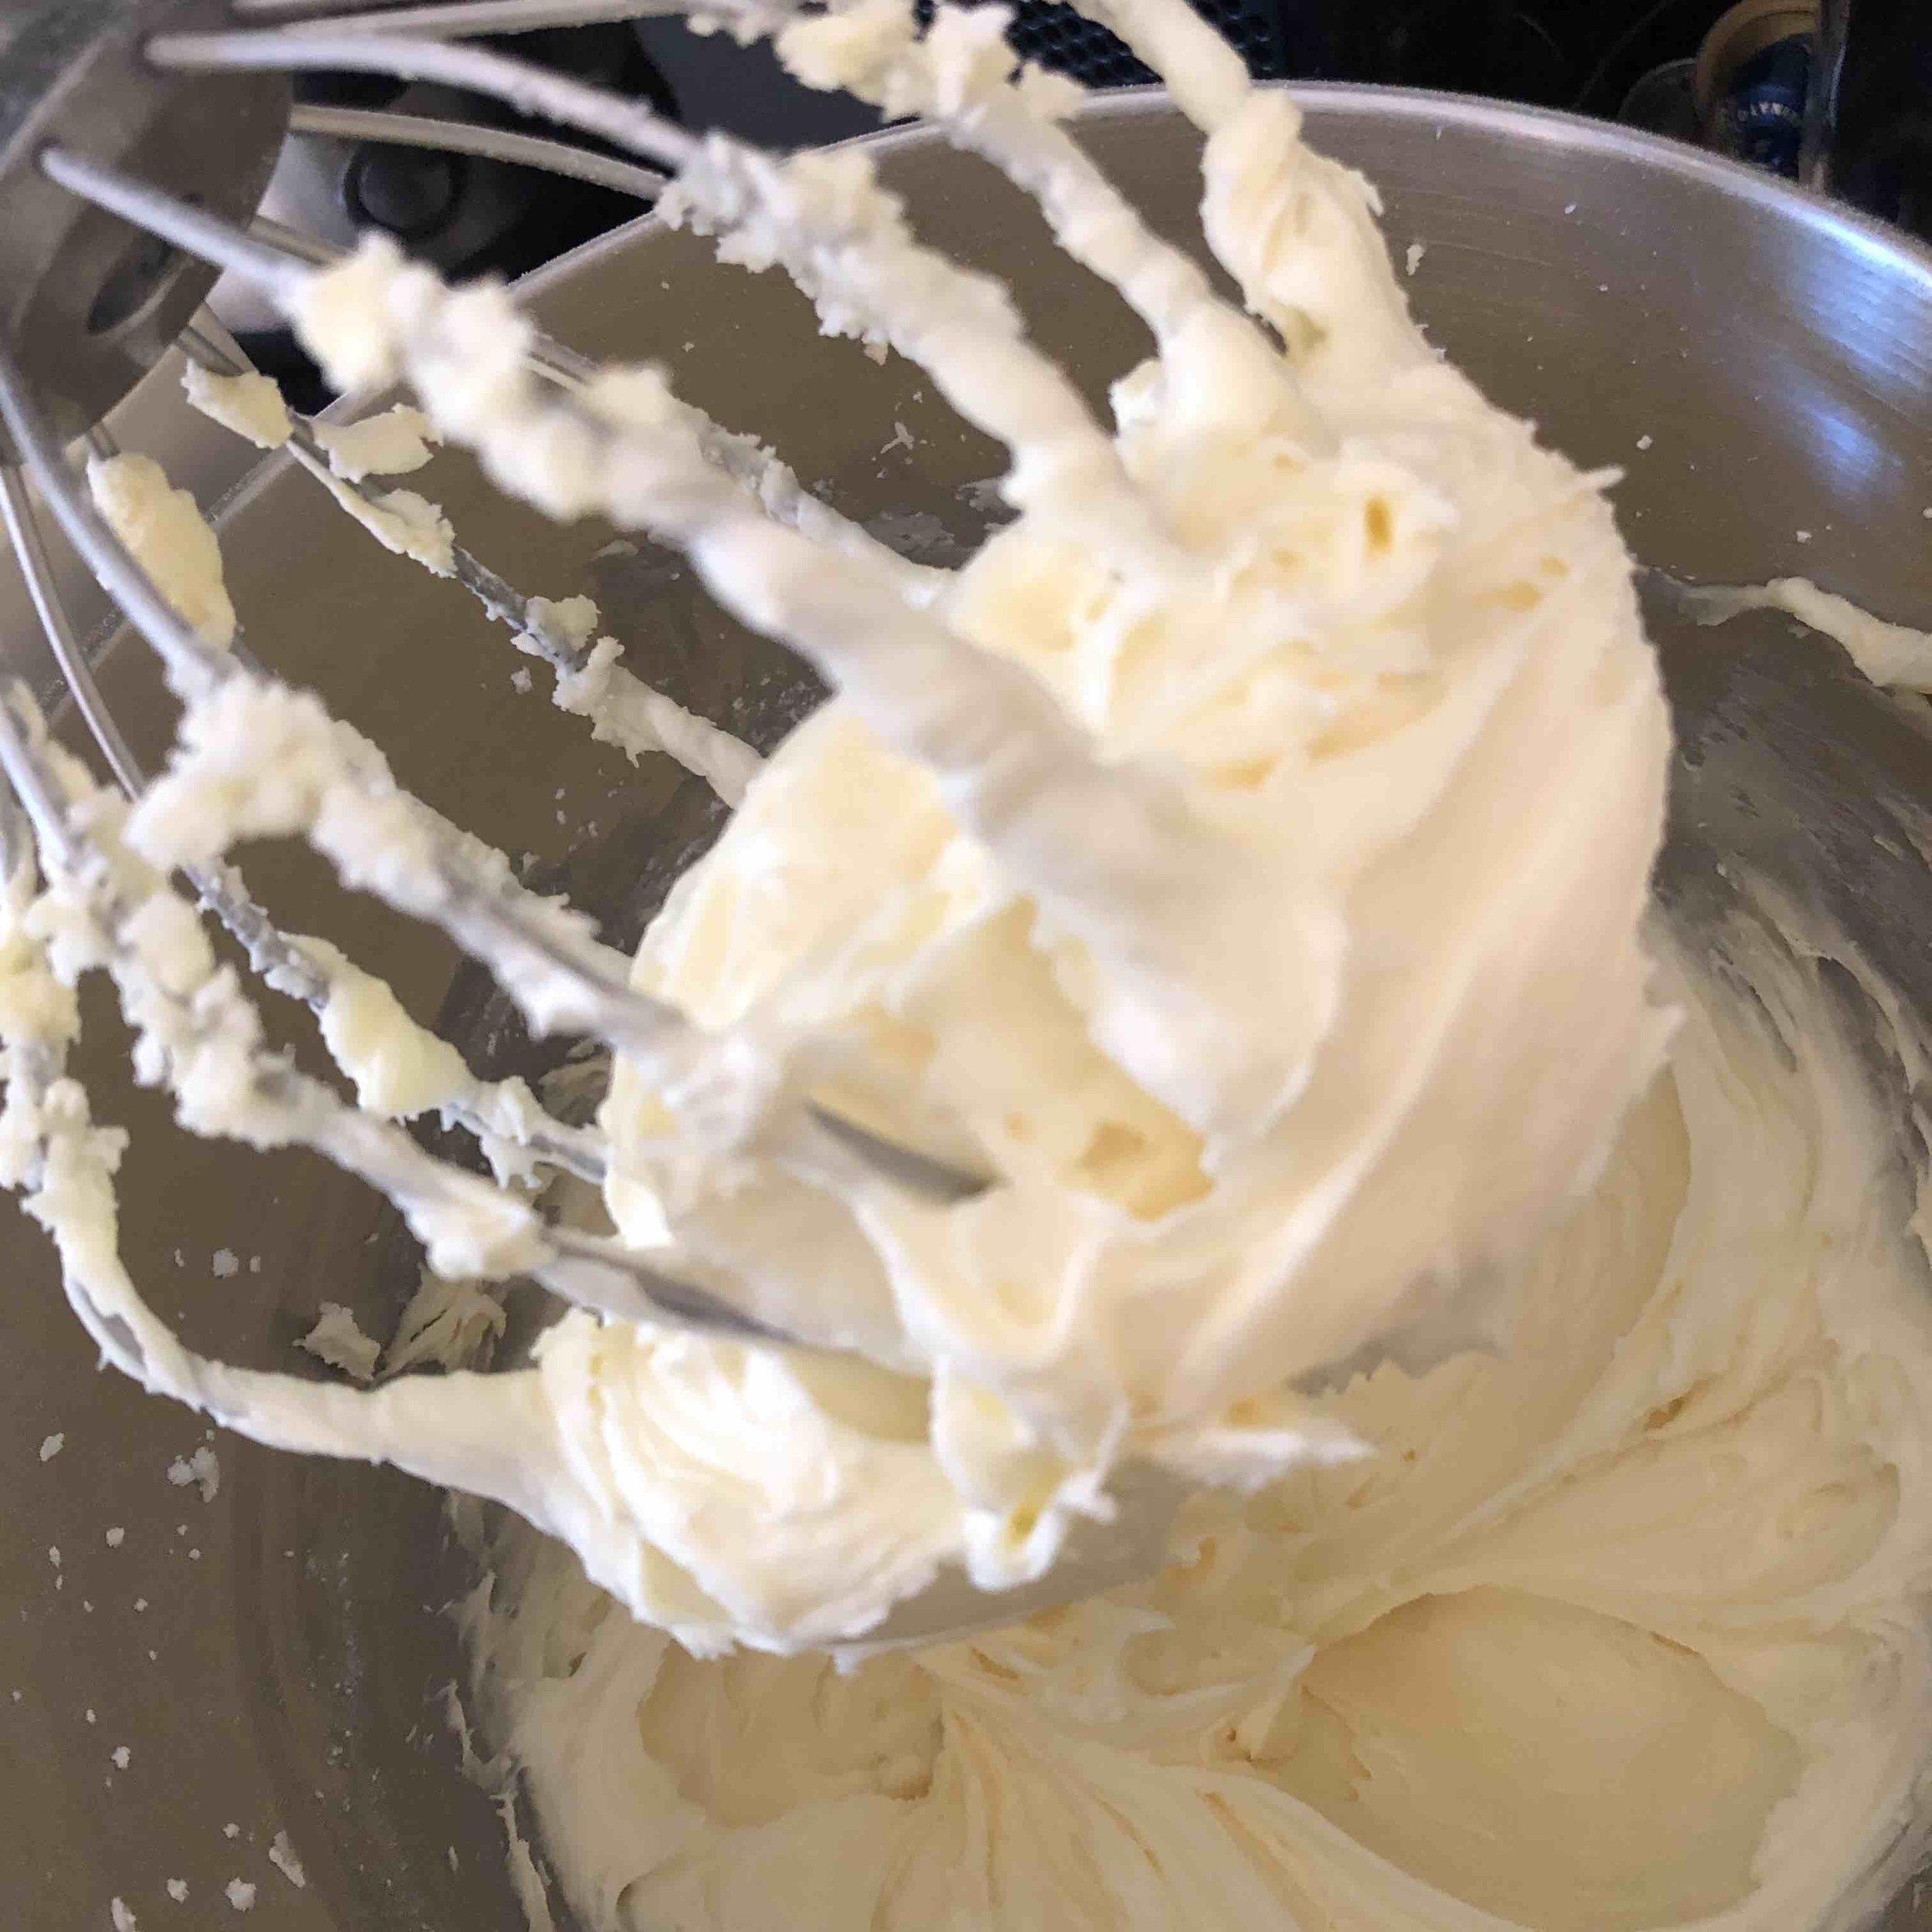 Cake beaters.jpg